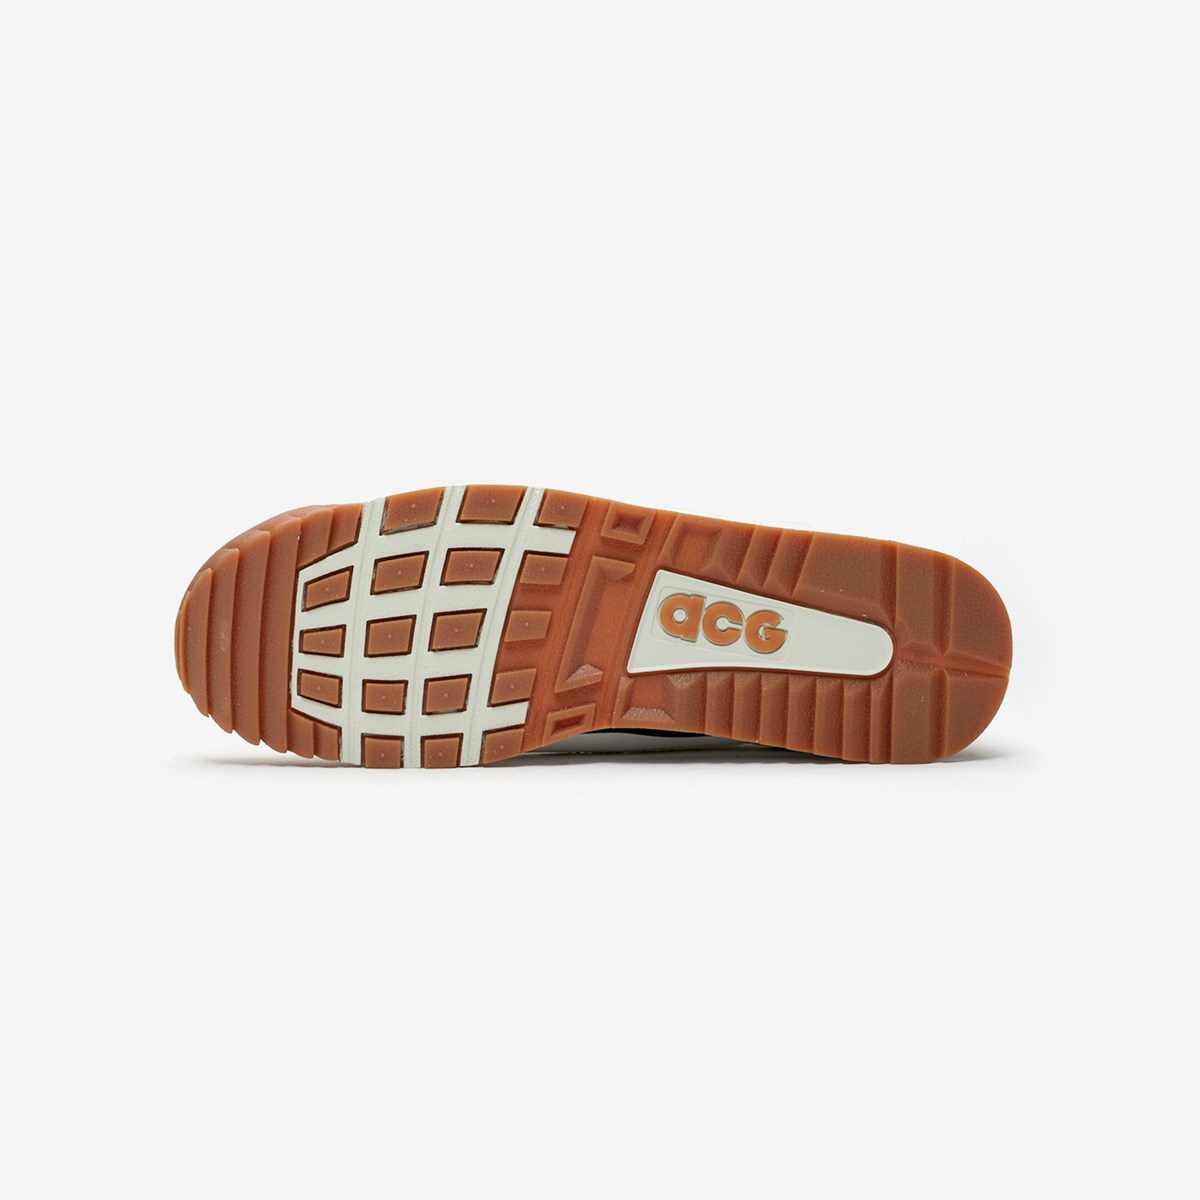 promo code 8e222 93313 Nike Air Wildwood ACG - Ao3116-100 - Sneakersnstuff   sneakers   streetwear  online since 1999